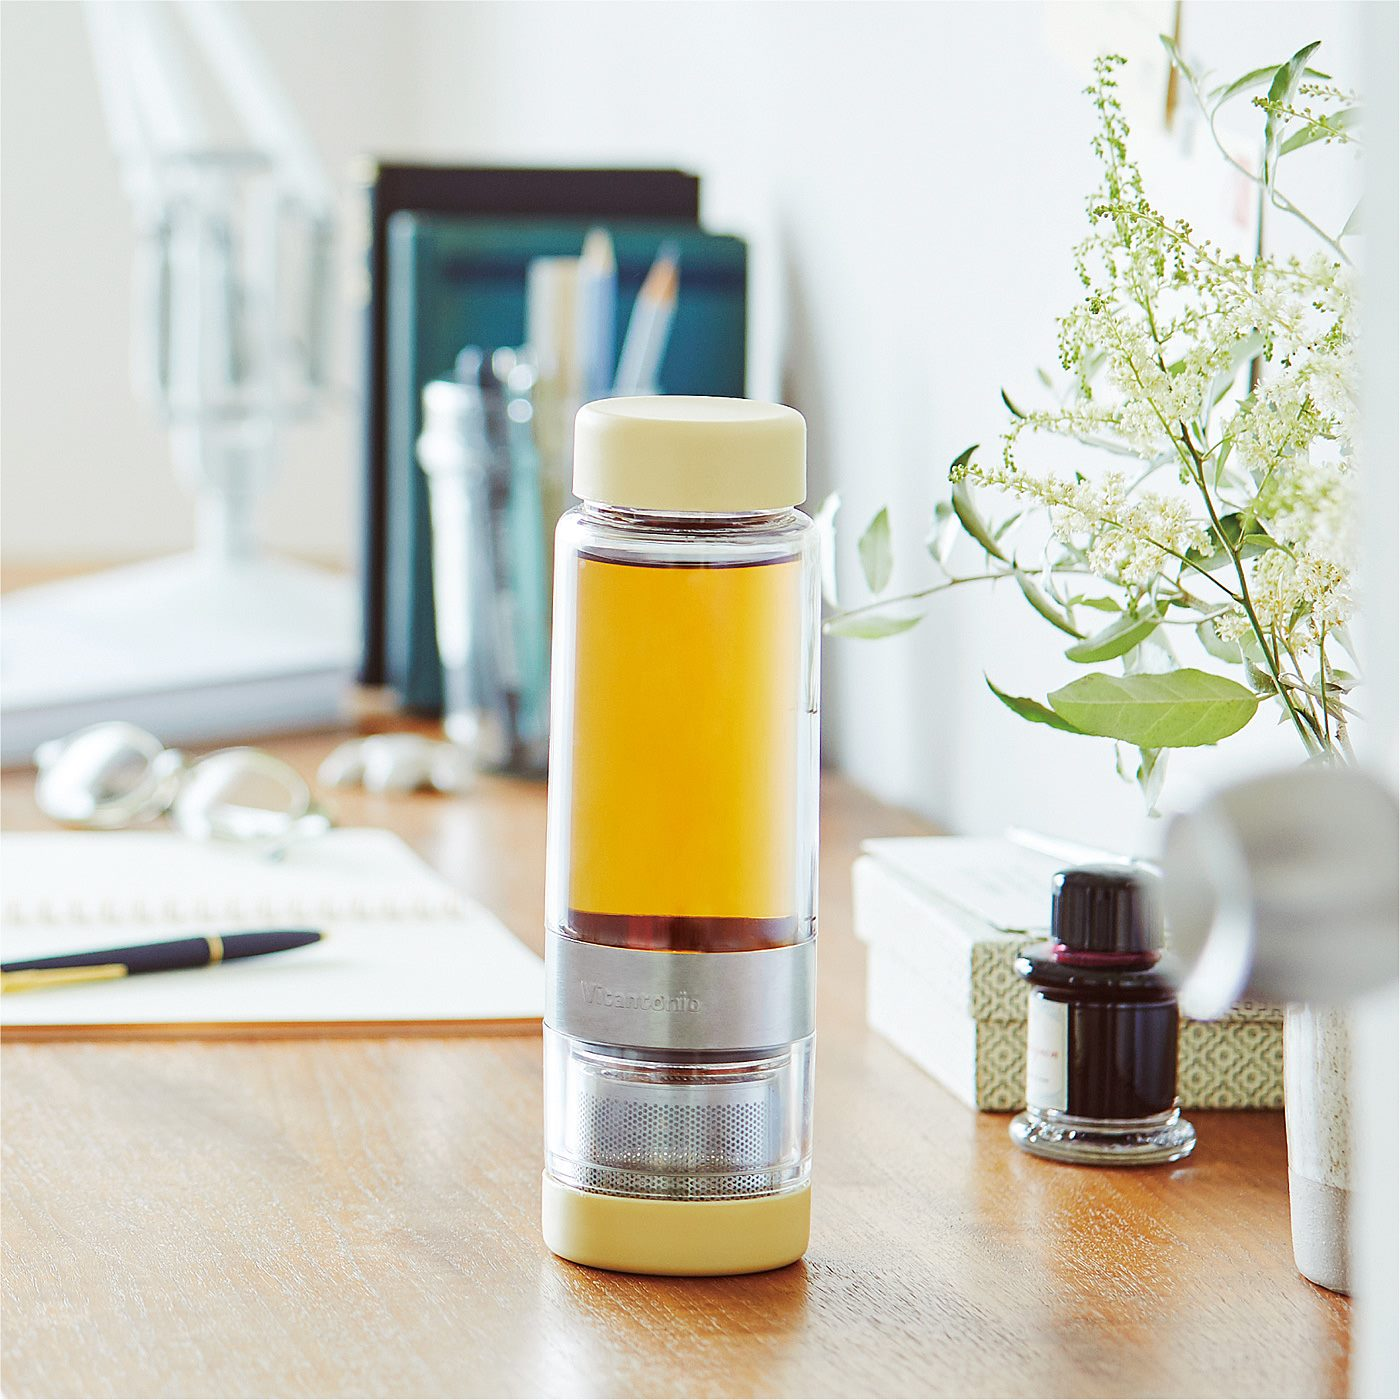 Kraso[クラソ] |飲みごろになったら茶葉を分離 2煎目も楽しめる 茶こし付きマイボトルの会|本体は二重構造で、持っても熱くなりにくく、結露も防ぐのでデスクづかいにもおすすめ。